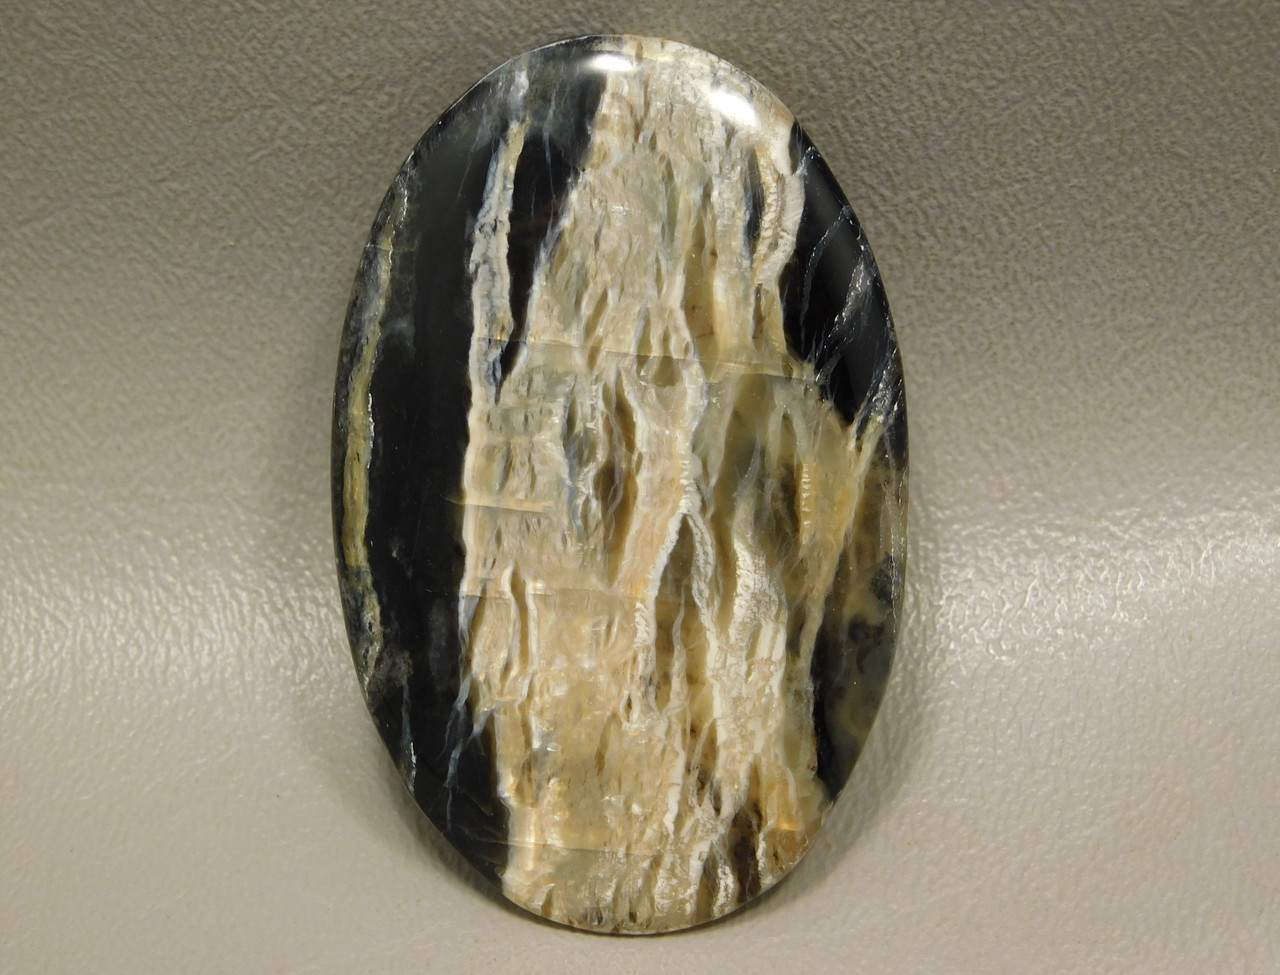 Stone Cabochon  Arizona Pietersite Black Gold Chatoyant Large Oval #4